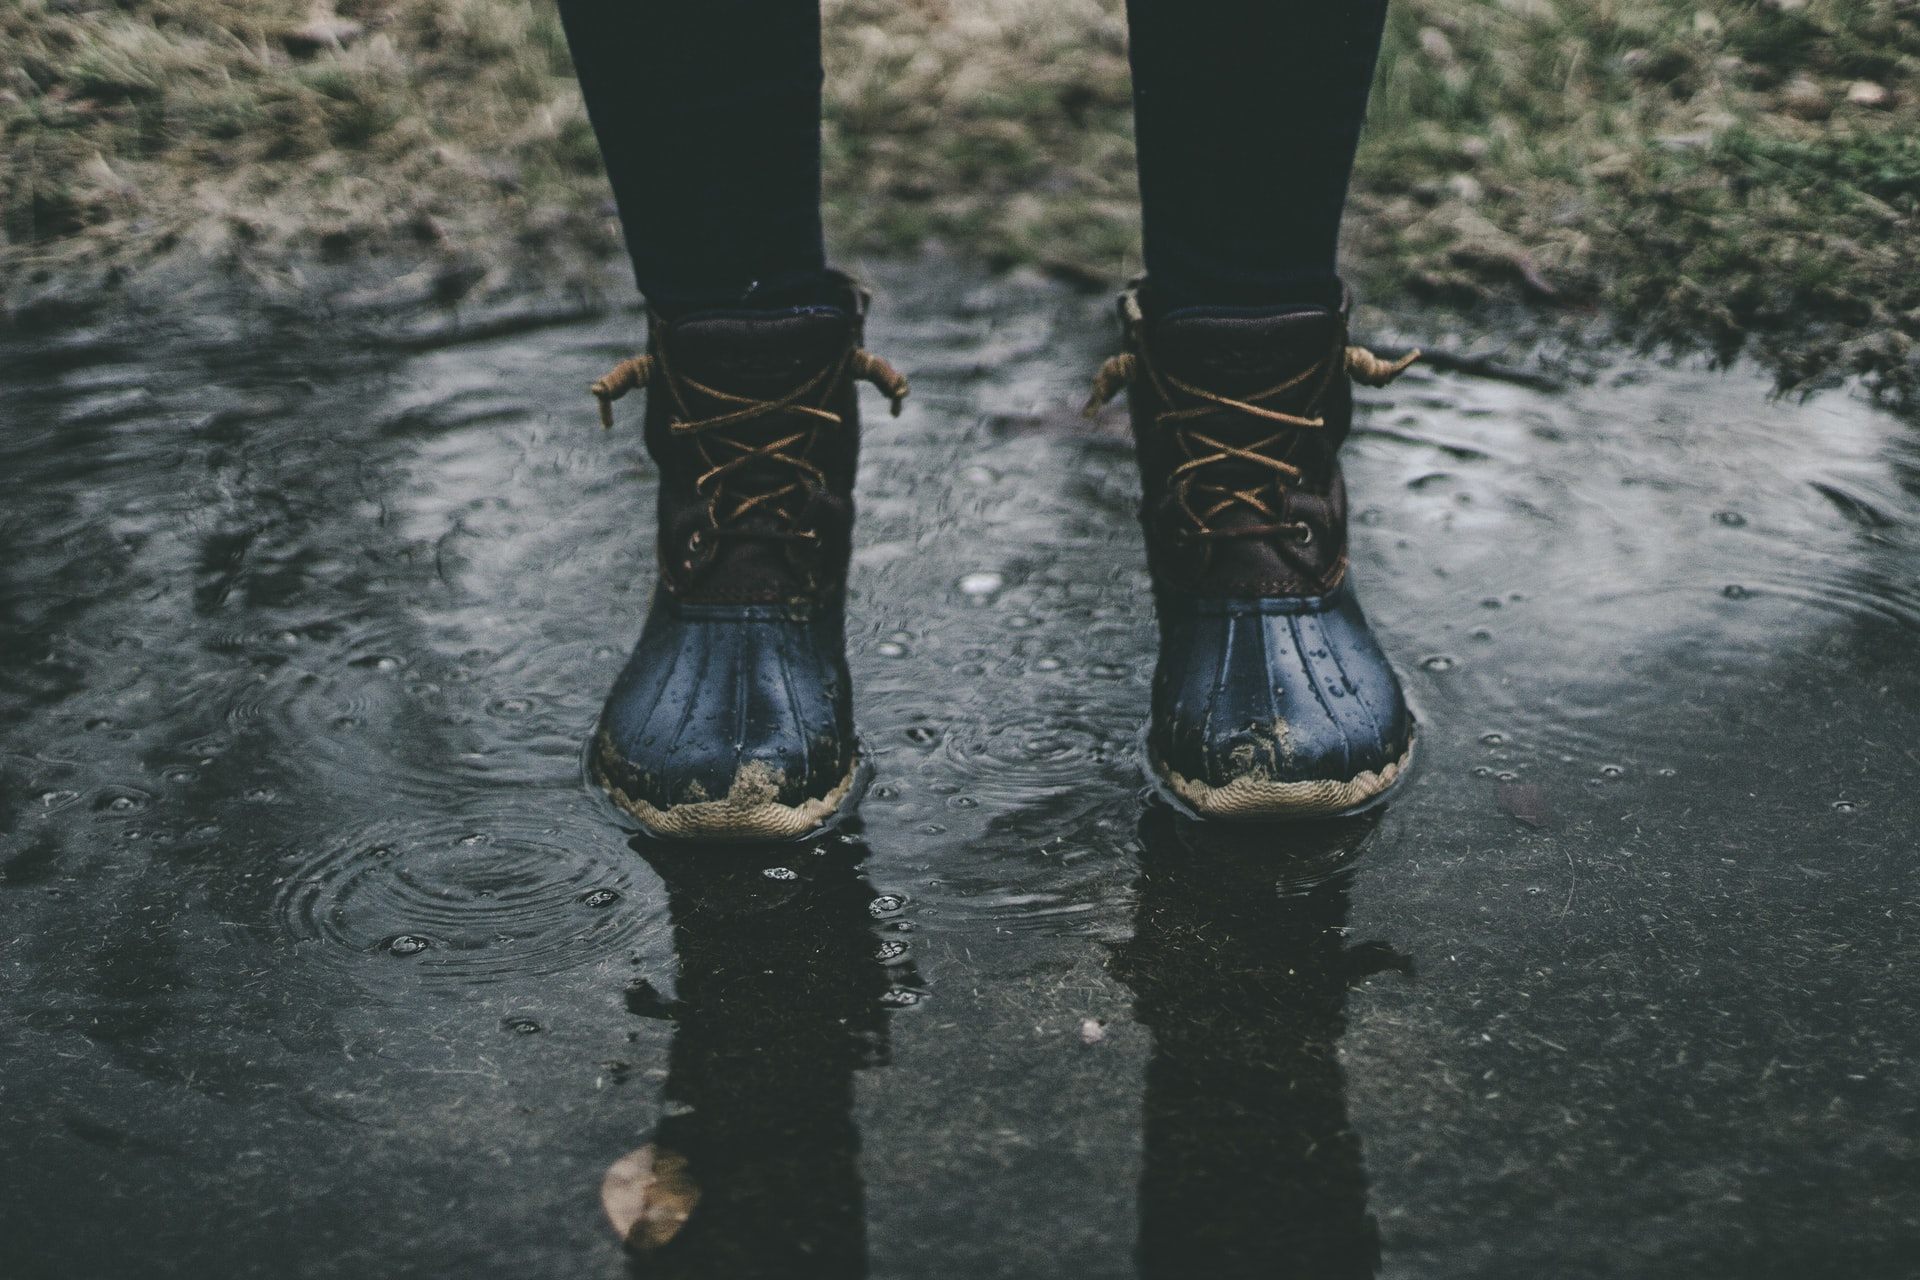 zapatos aprueba de agua